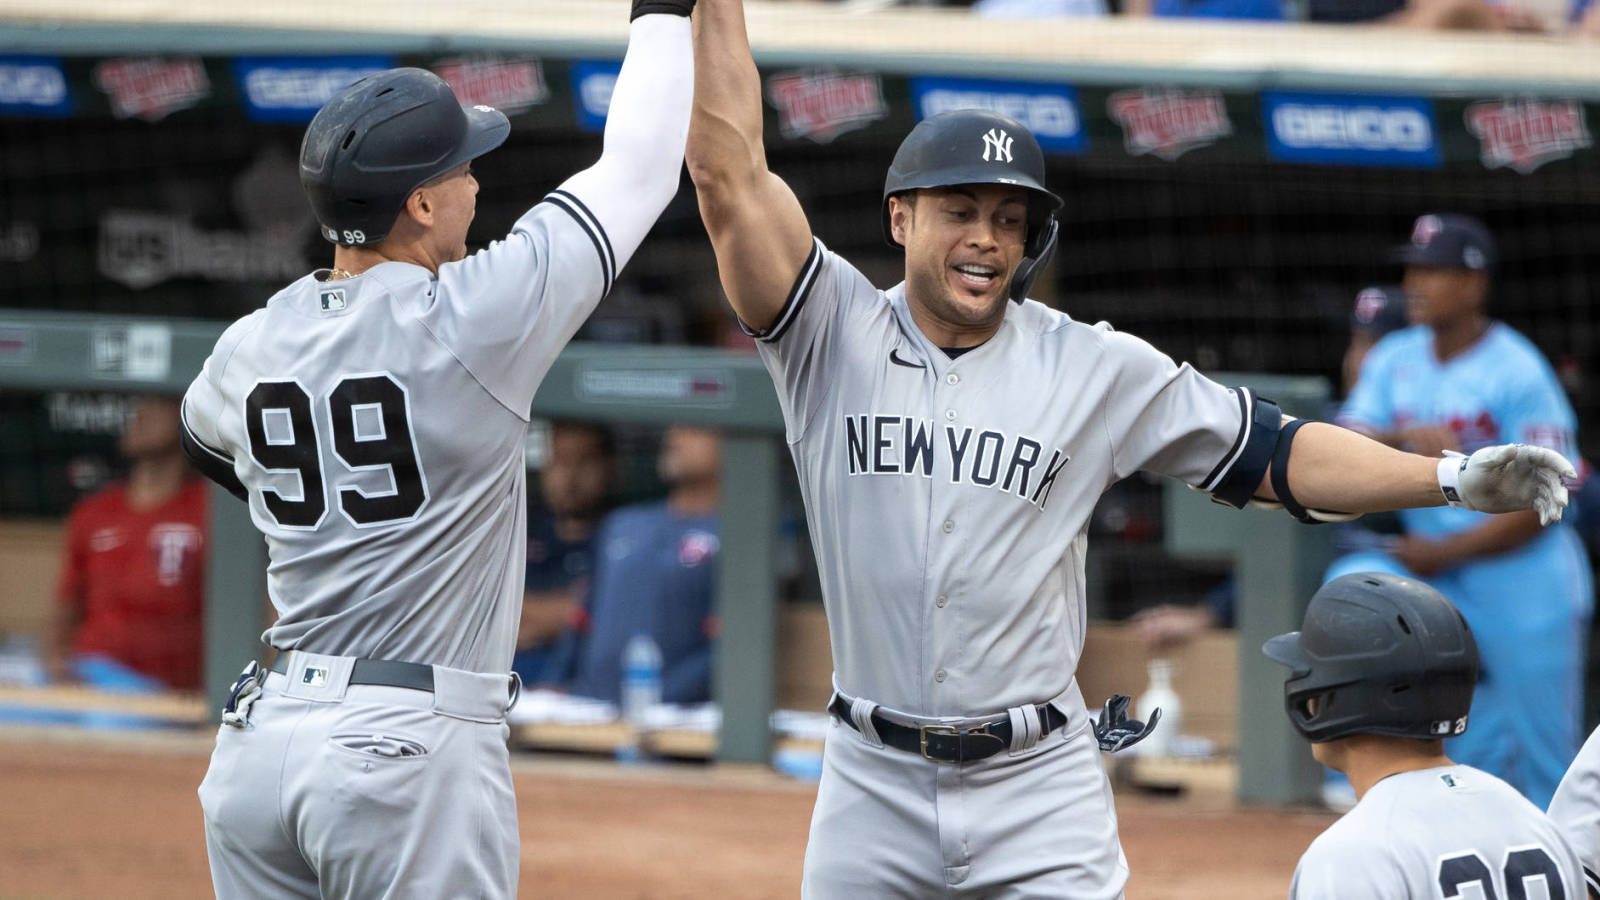 The questionnaire 'Yankees to reach more than 40 HR'